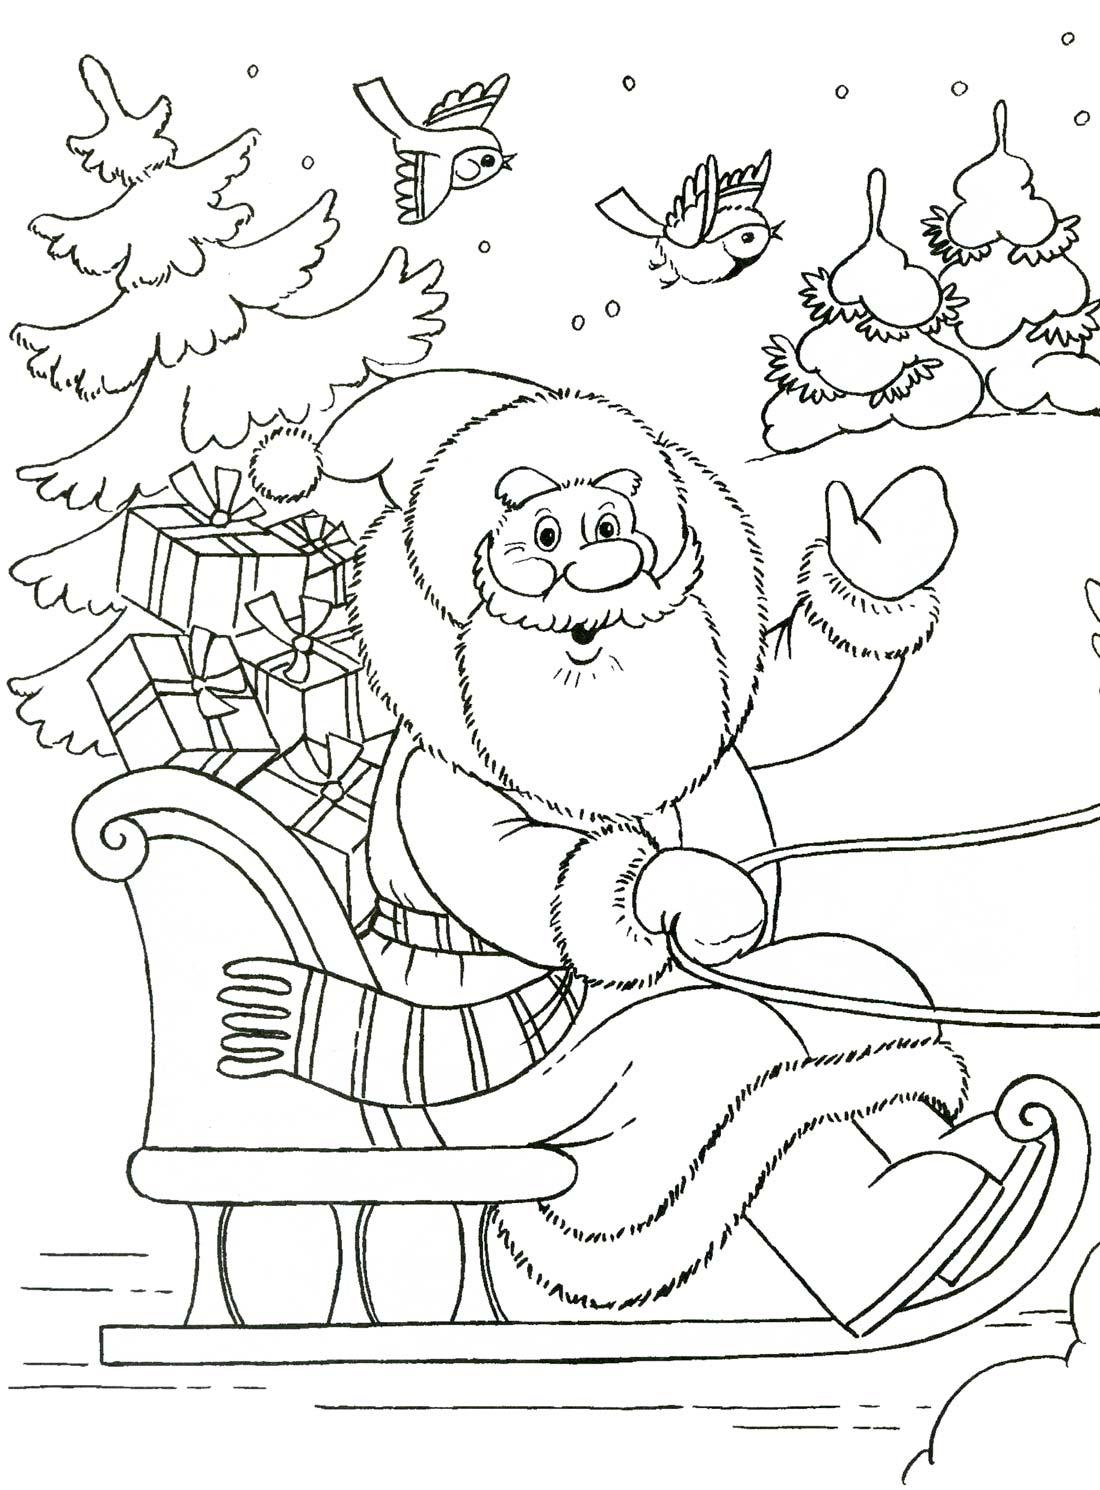 Картинки раскраски в детском саду зима